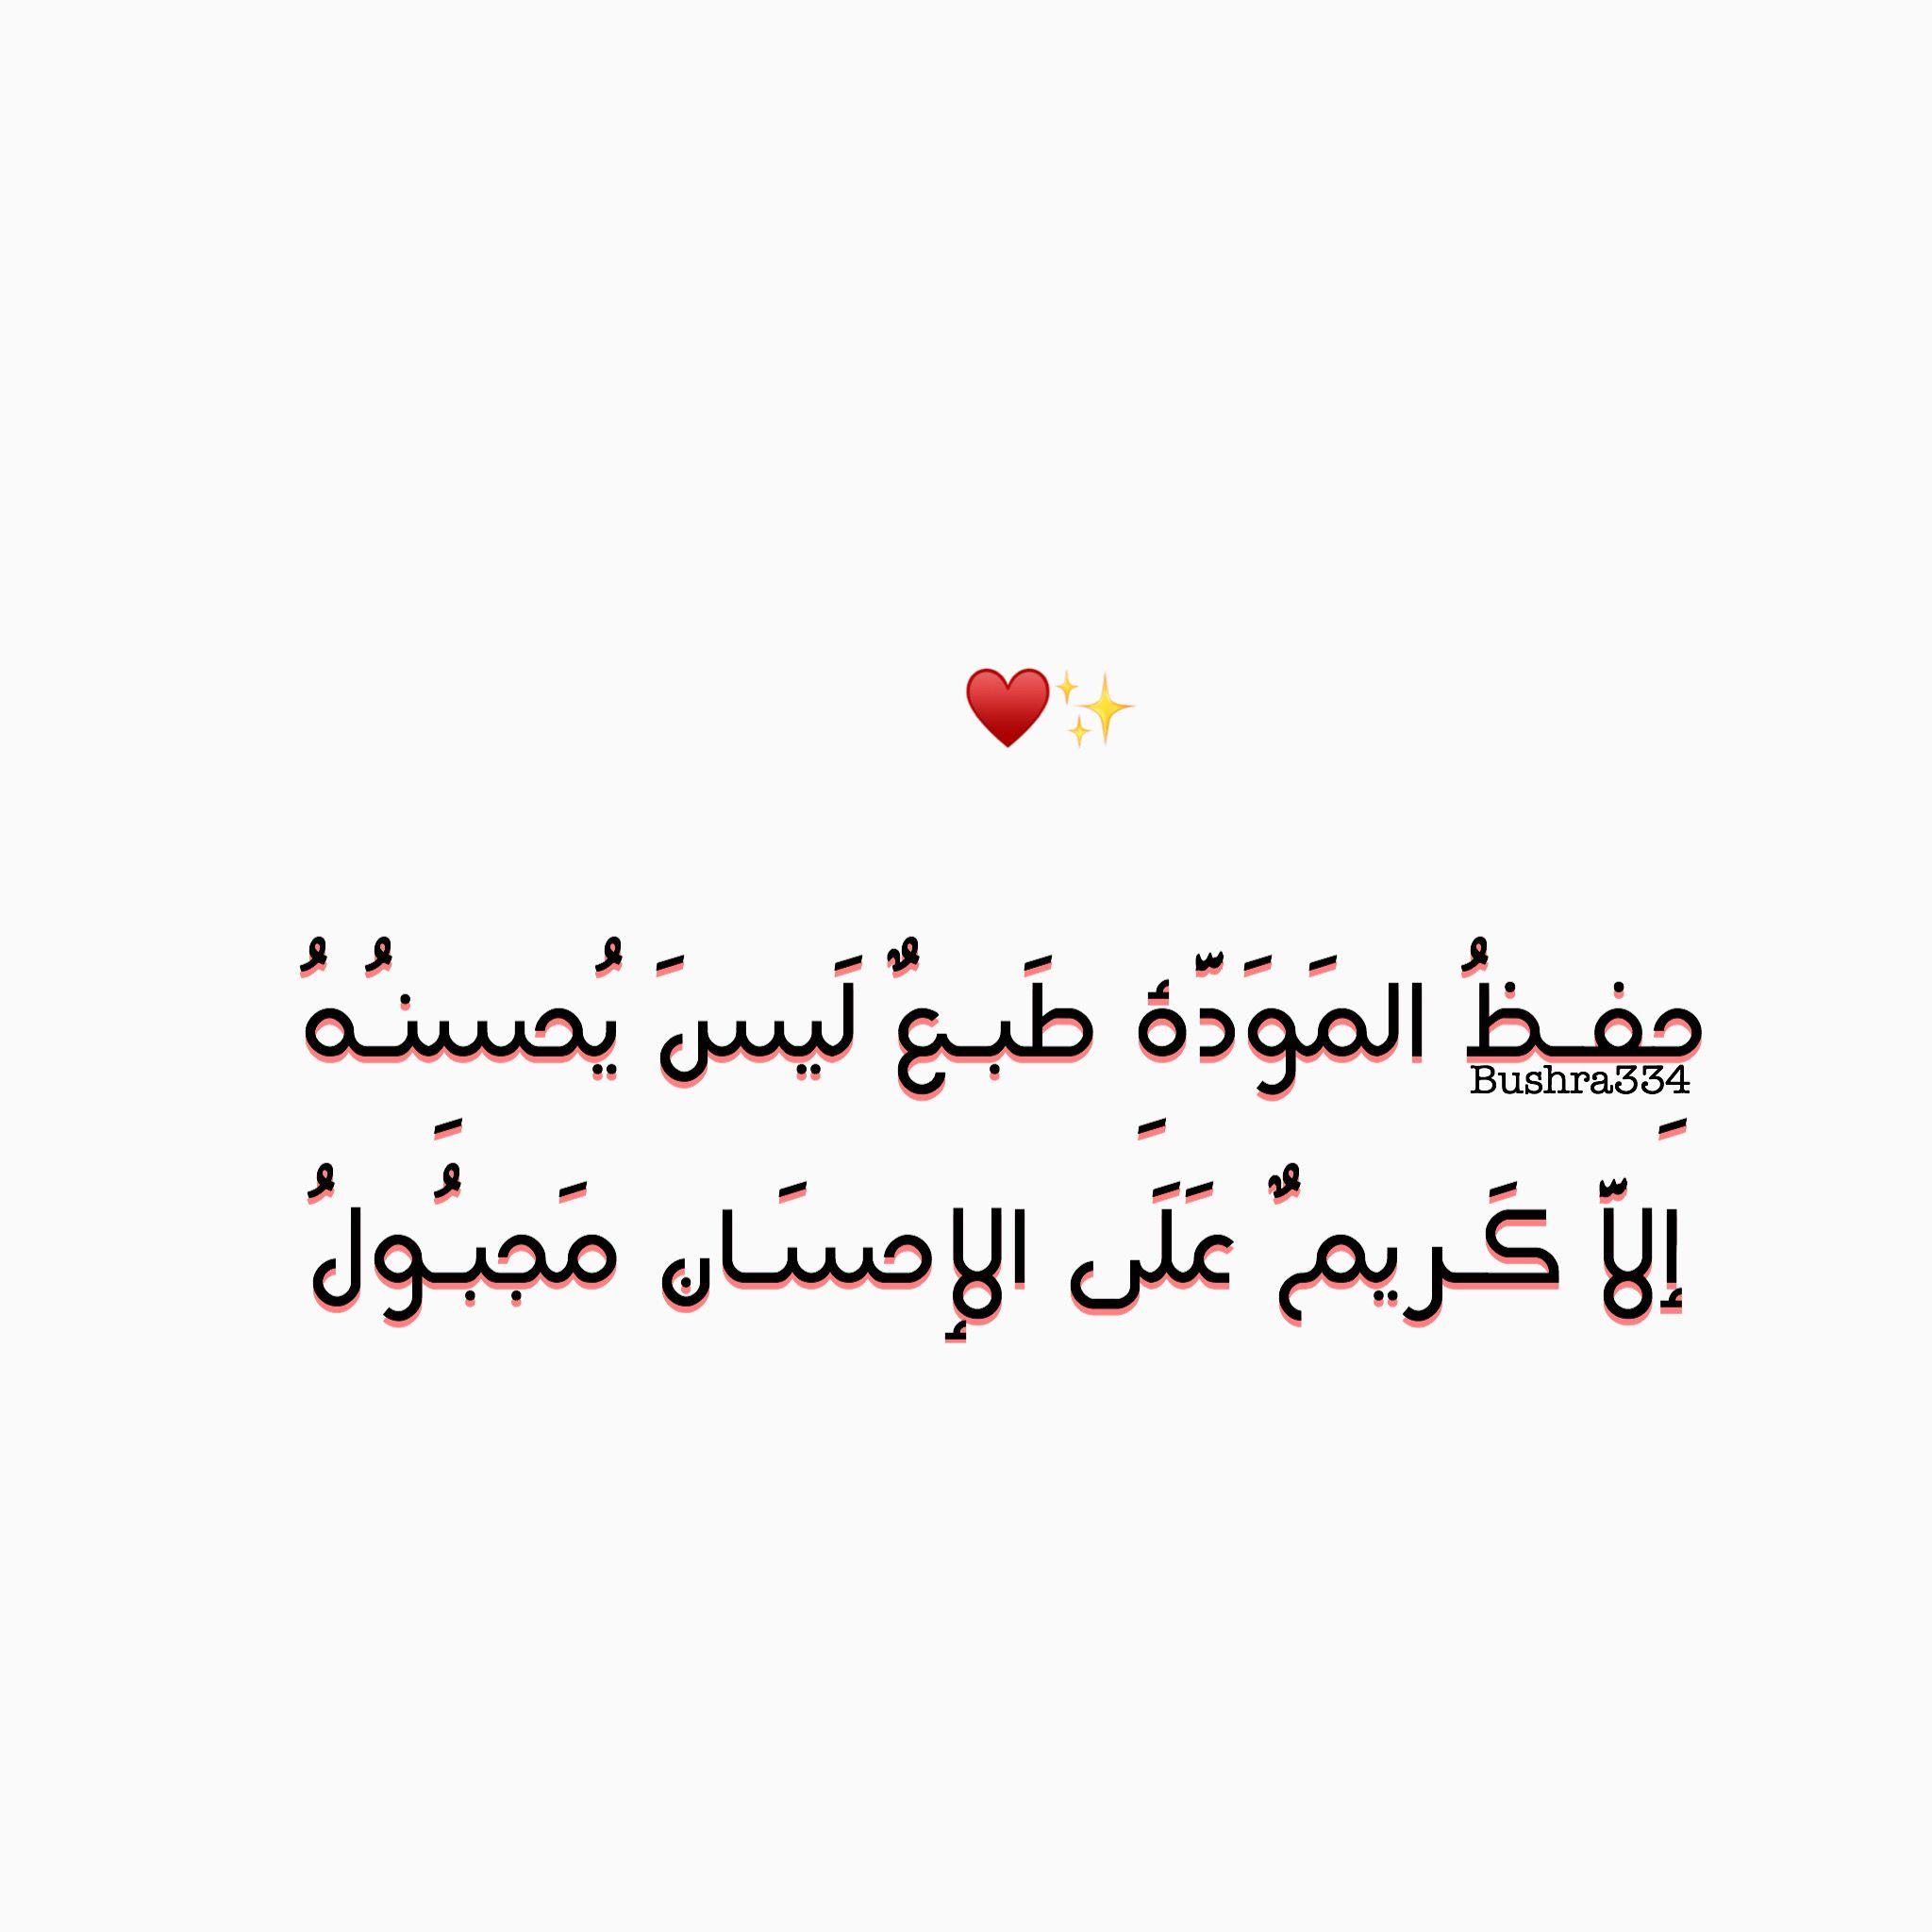 حفظ المودة اقتباسات Quotes Arabic Quotes Arabic Calligraphy